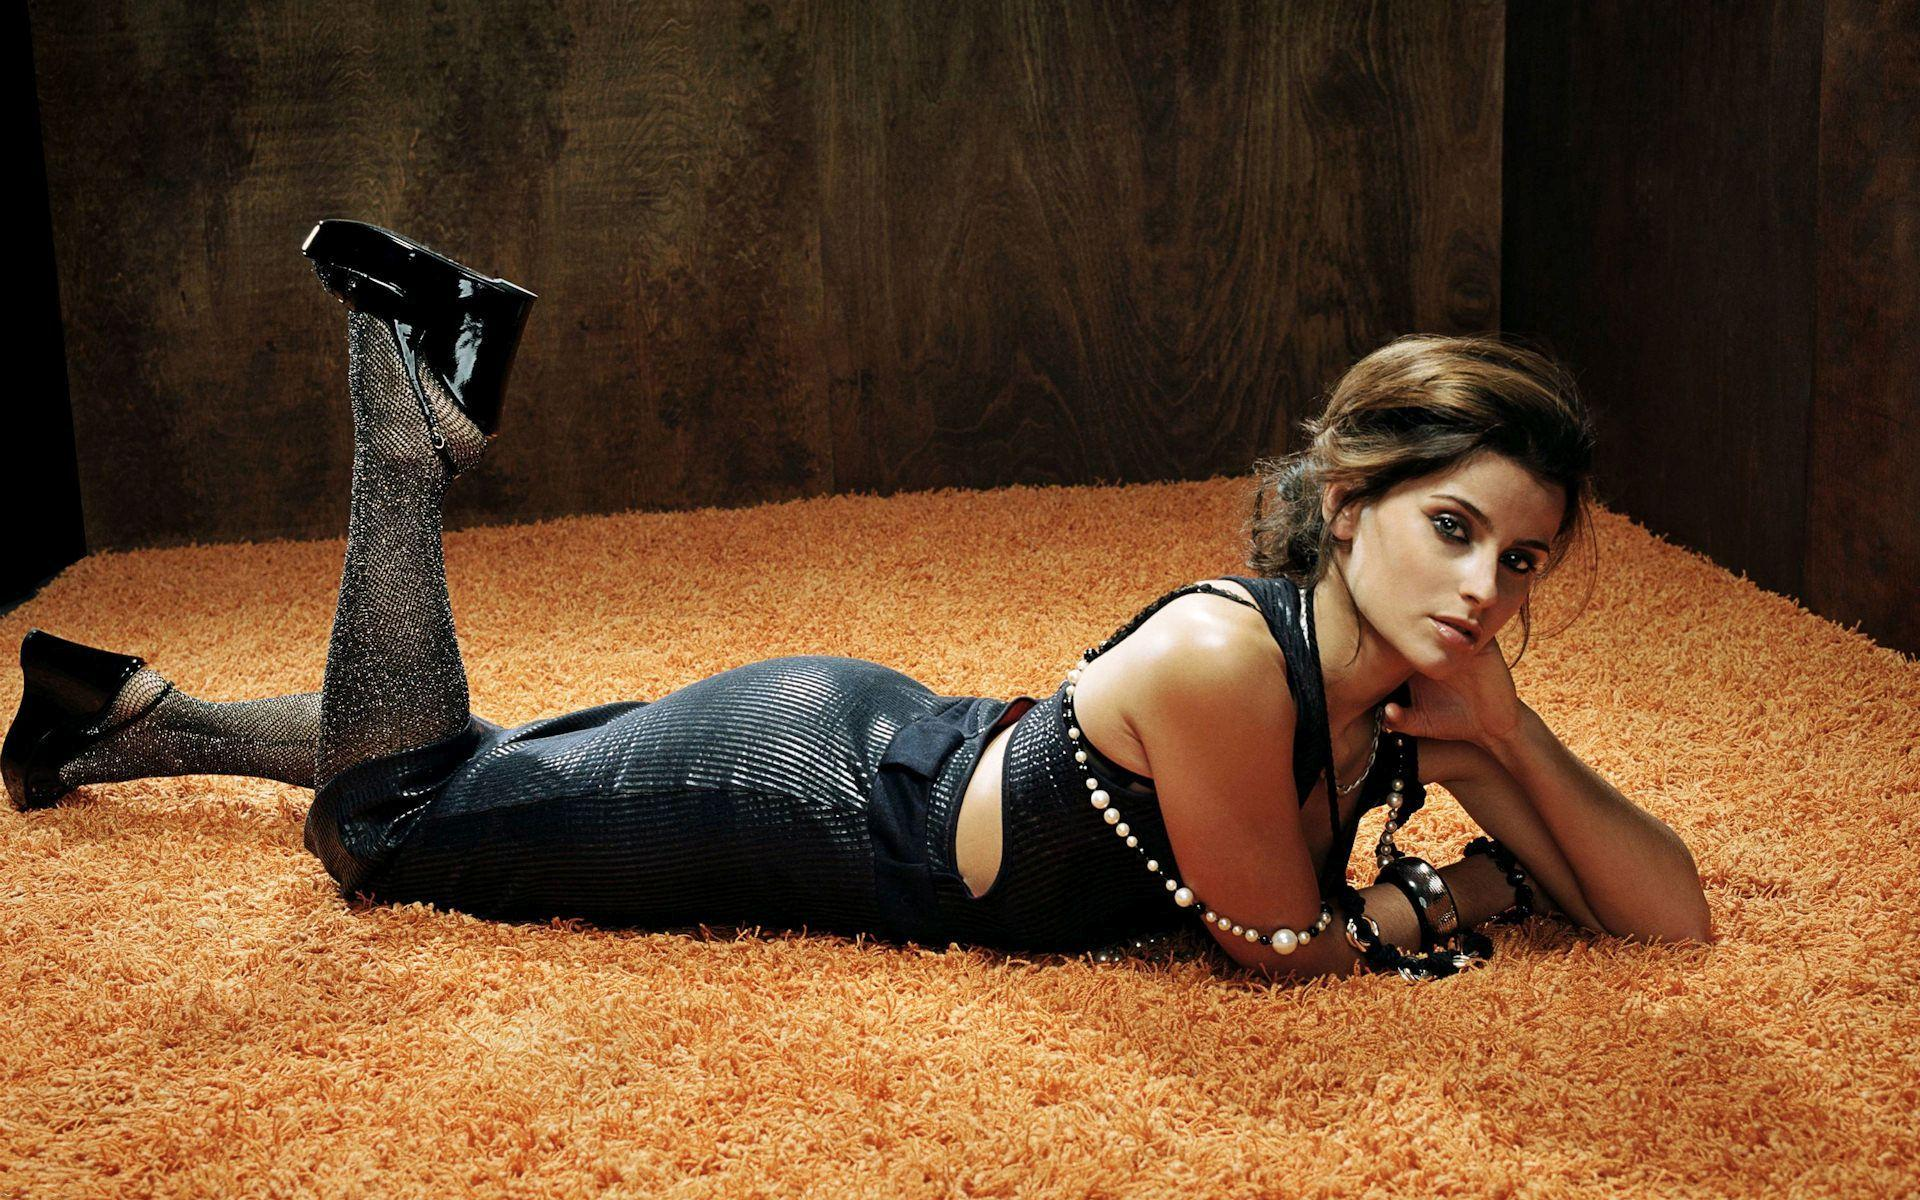 HD Nelly Furtado in a black dress Wallpaper  Download